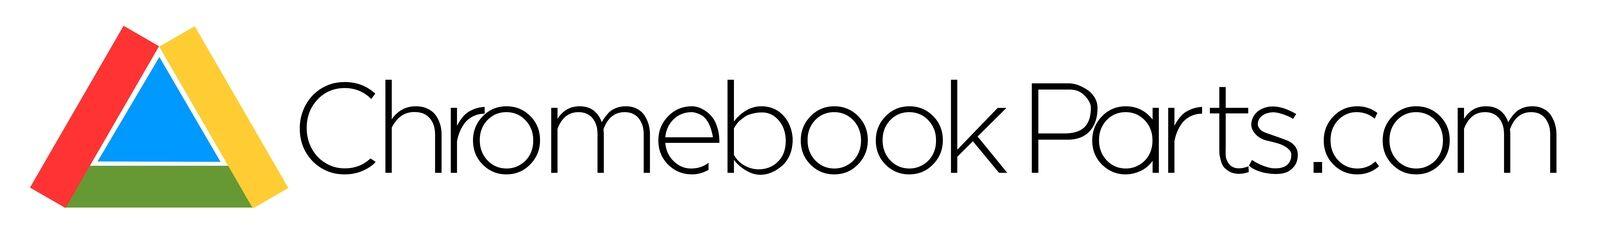 Chromebook Parts